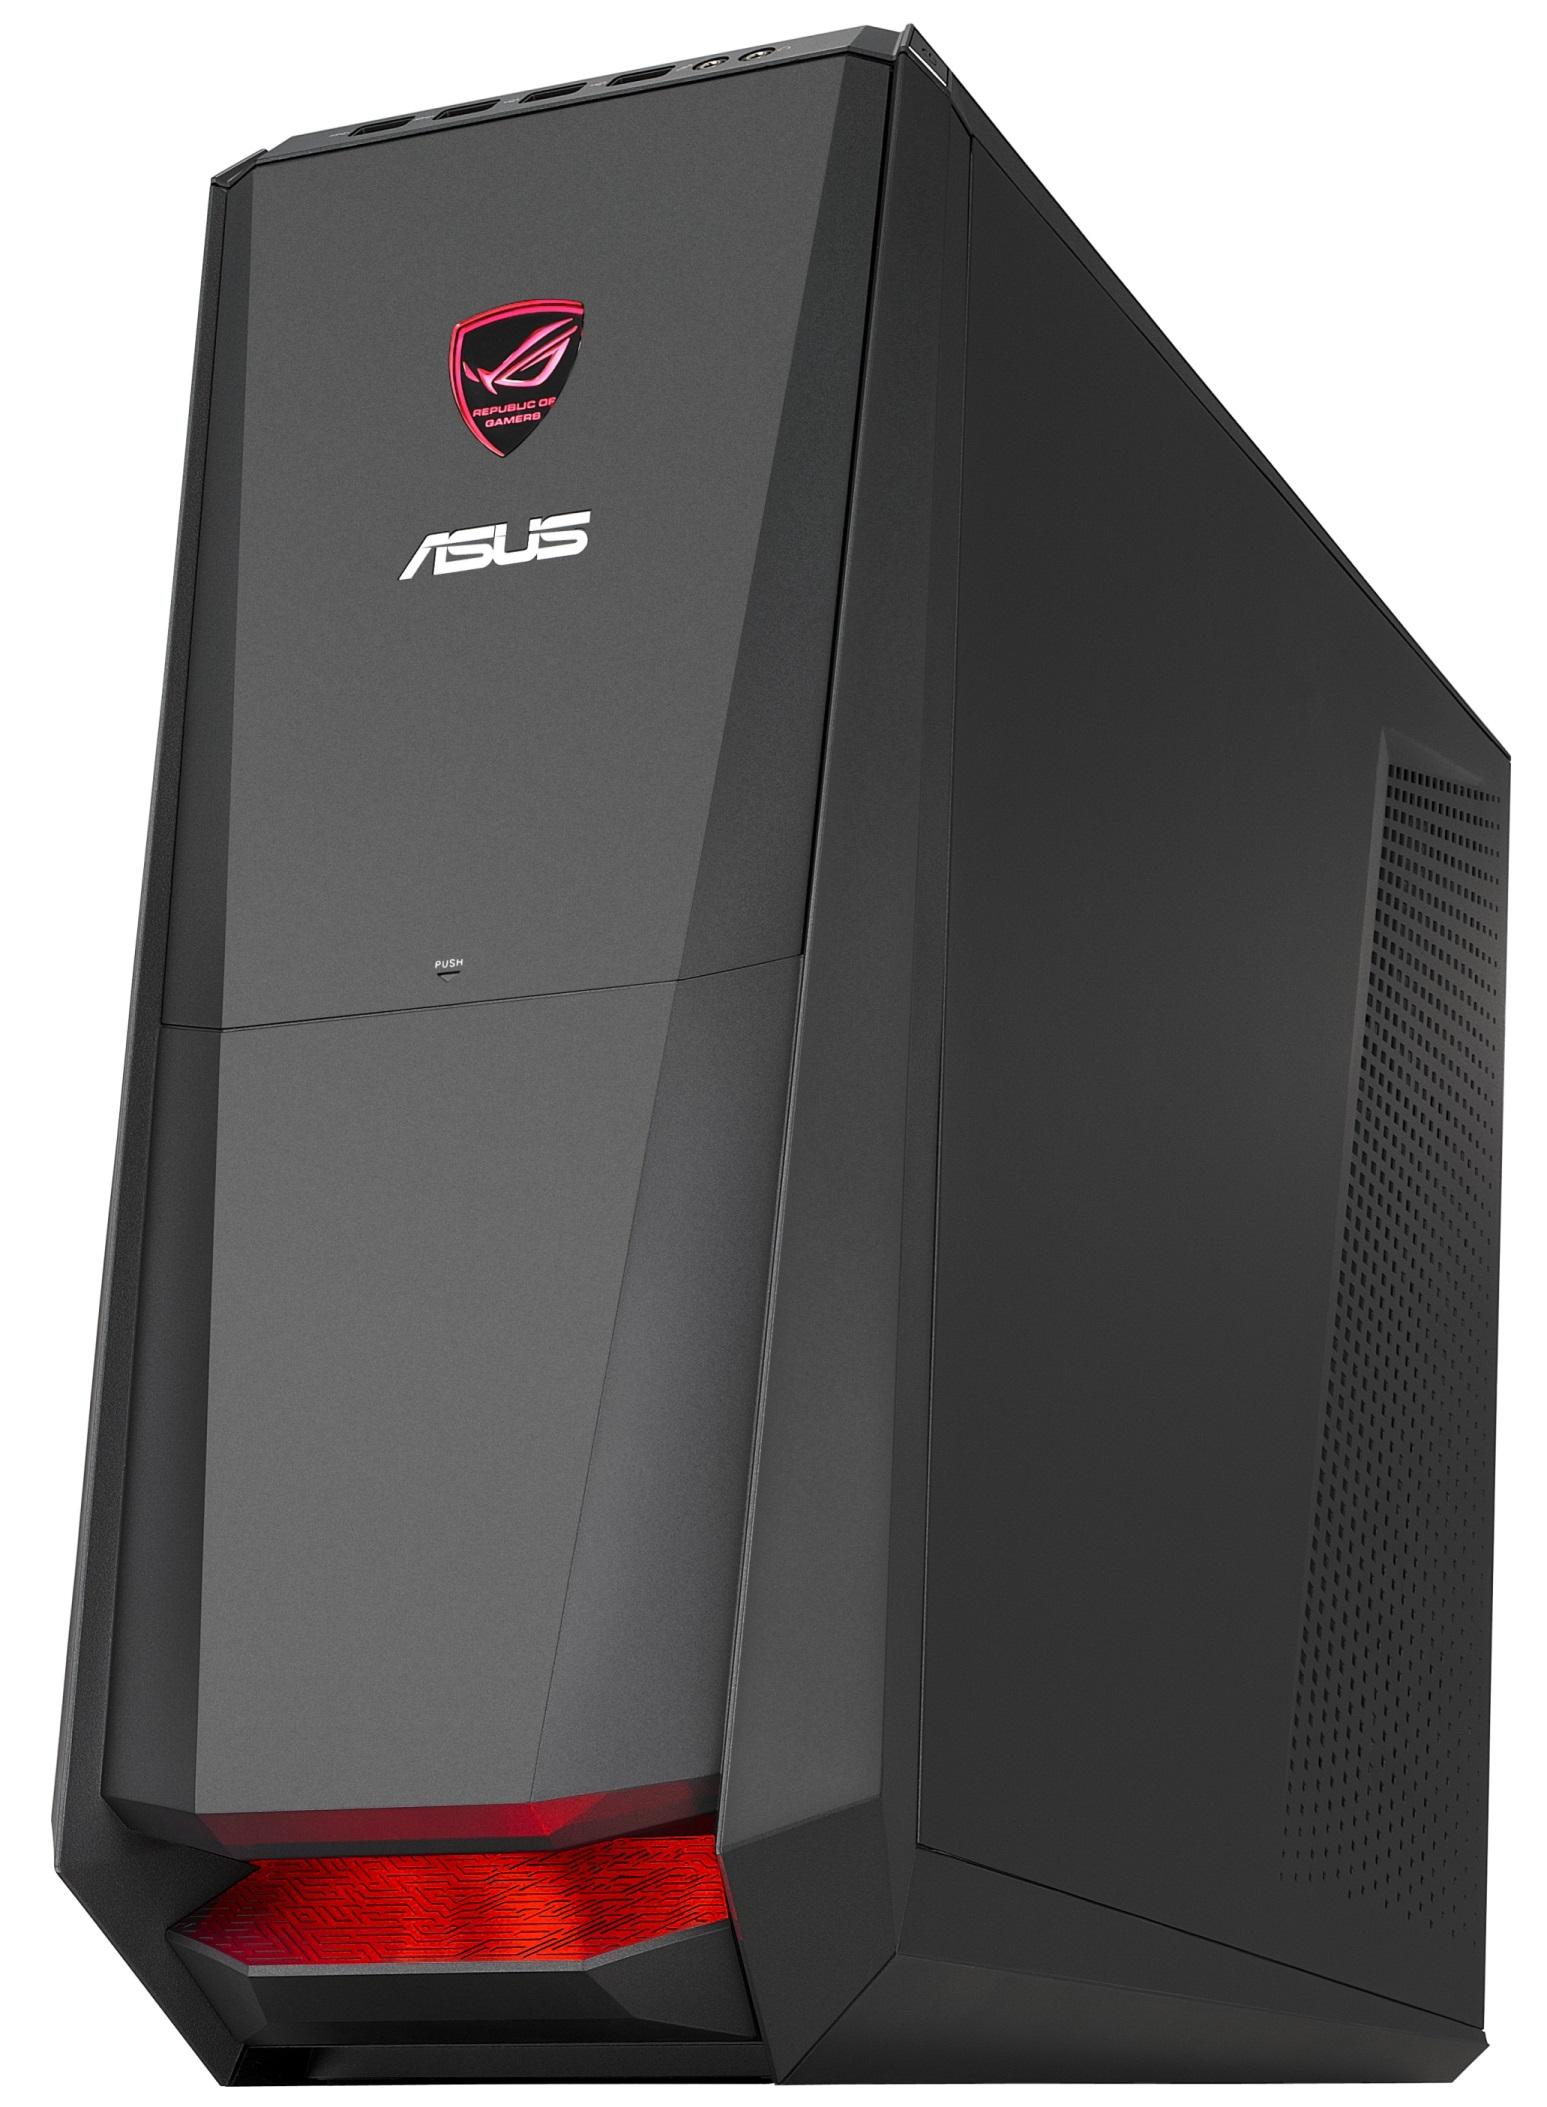 asus-rog-g30-gaming-desktop-pc-with-rog-audiowizard.jpg